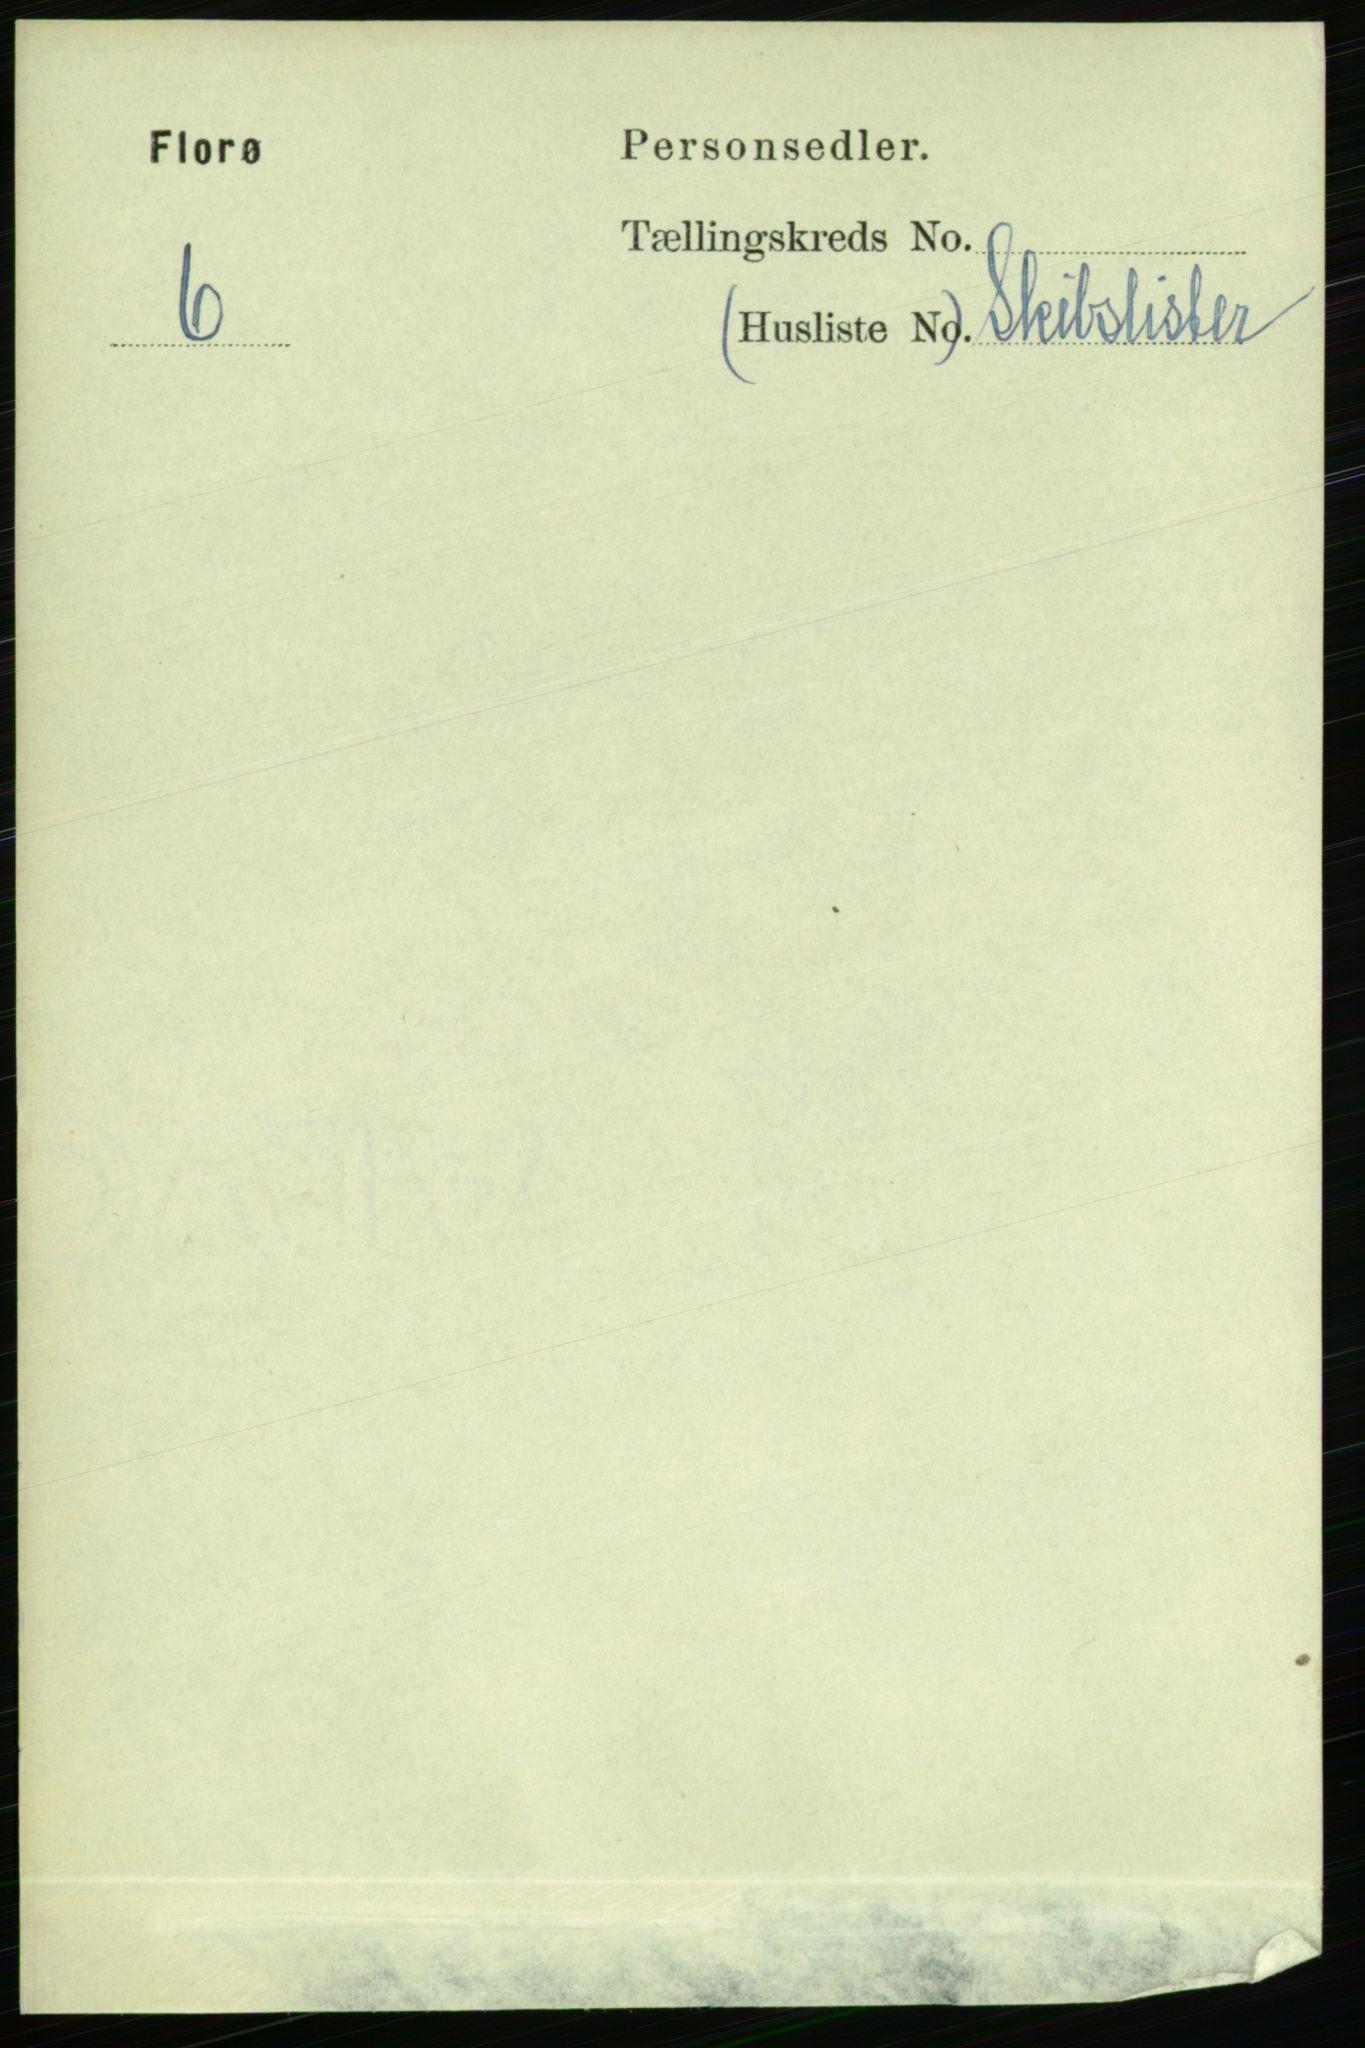 RA, Folketelling 1891 for 1401 Florø ladested, 1891, s. 842